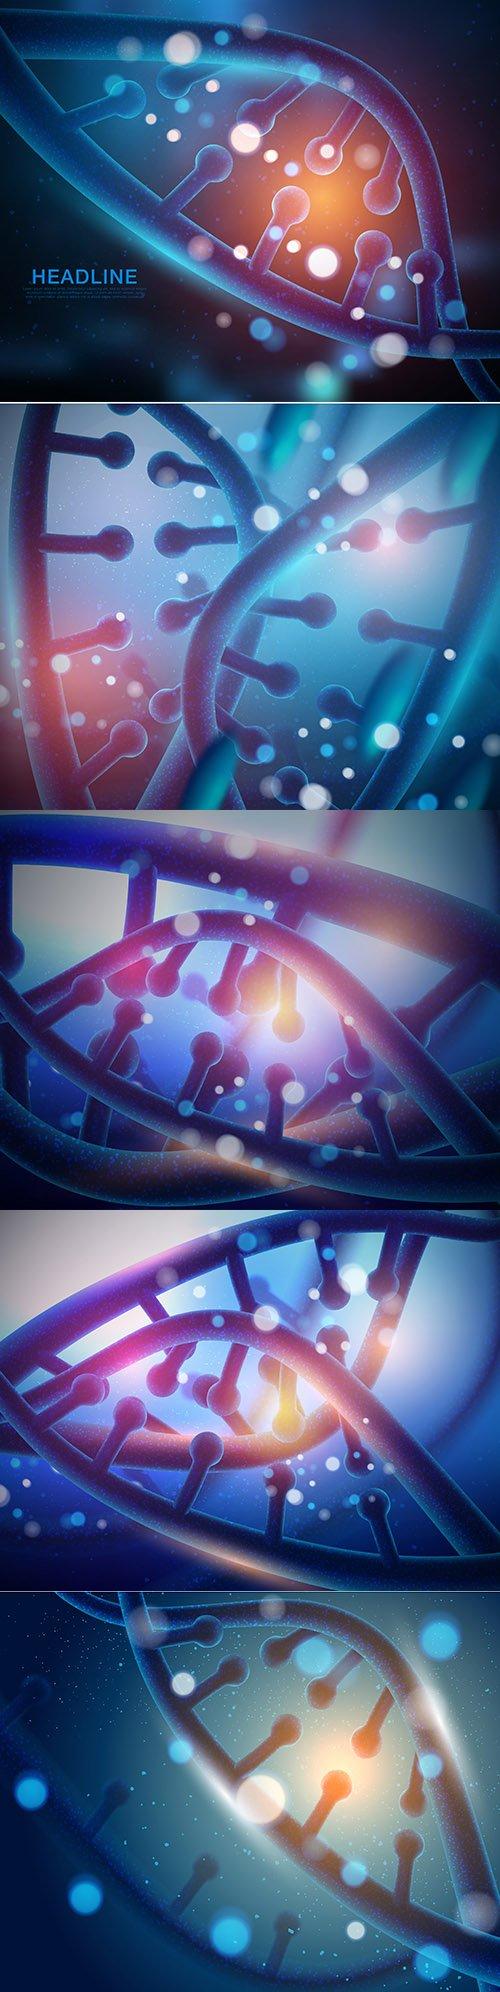 Vector Pack of Luminous Dna Molecule